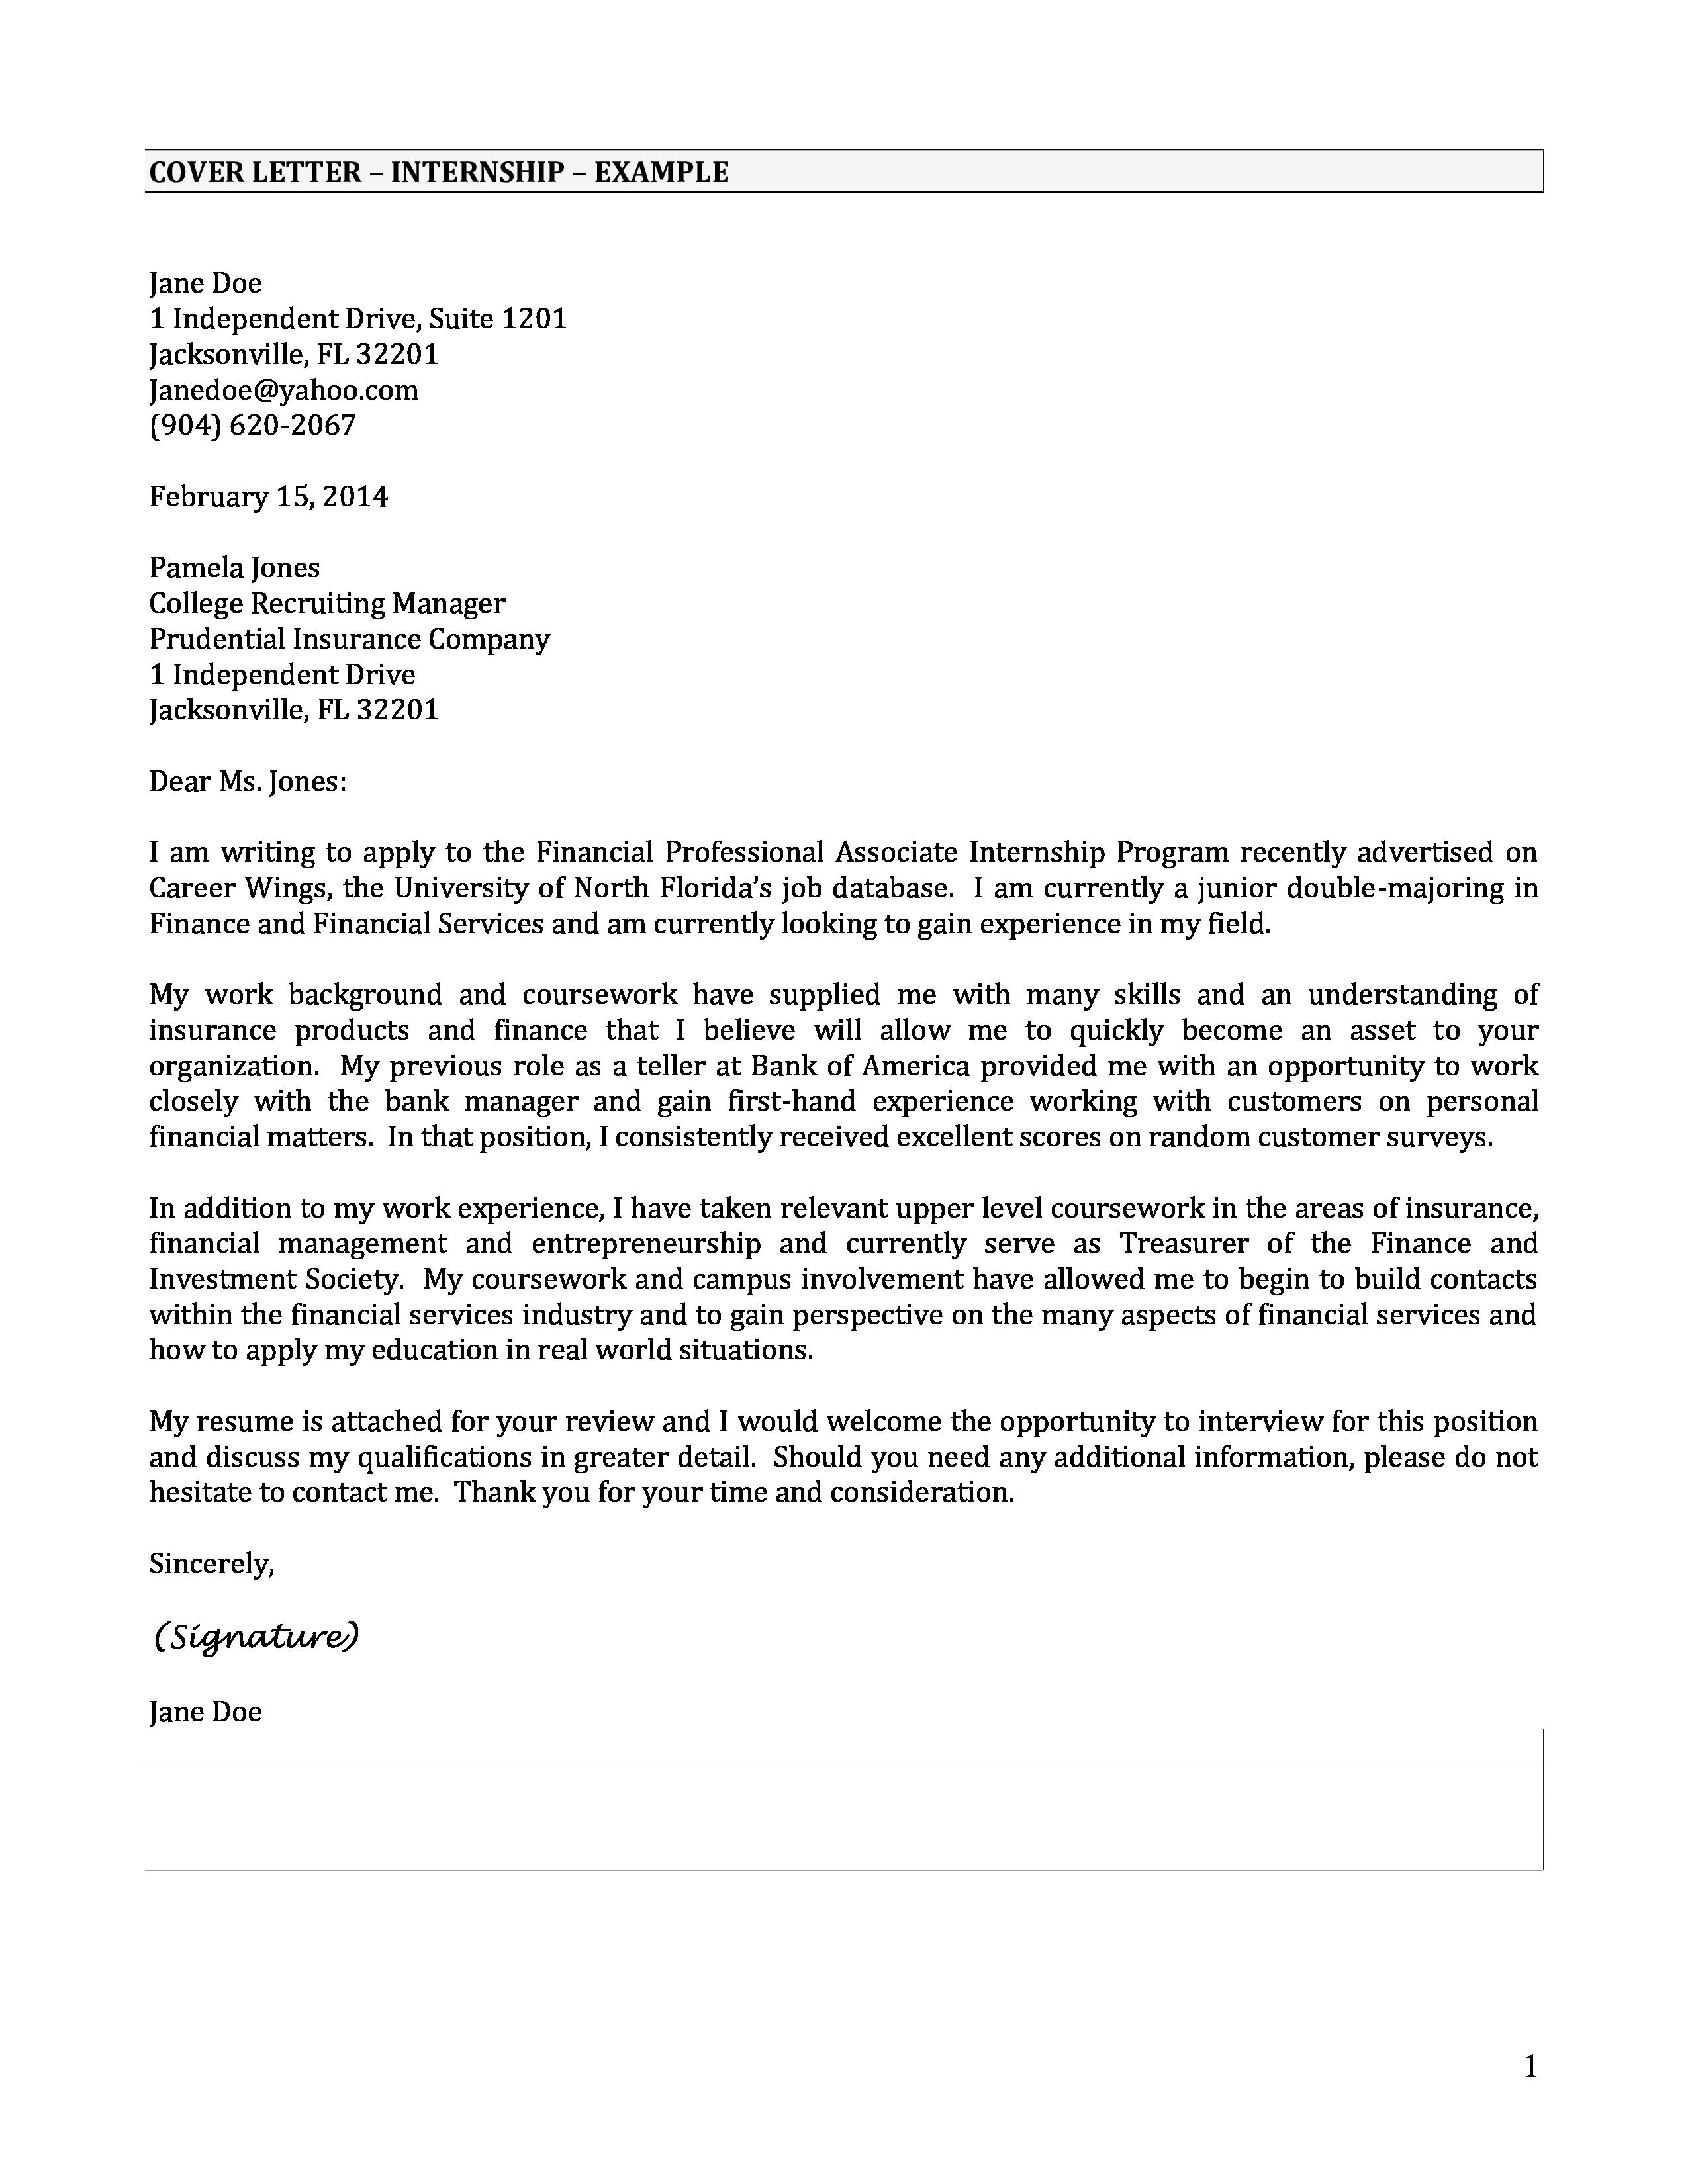 finance internship cover letter how to write a restaurant resume sample free maker reddit downloadable cv templates for word